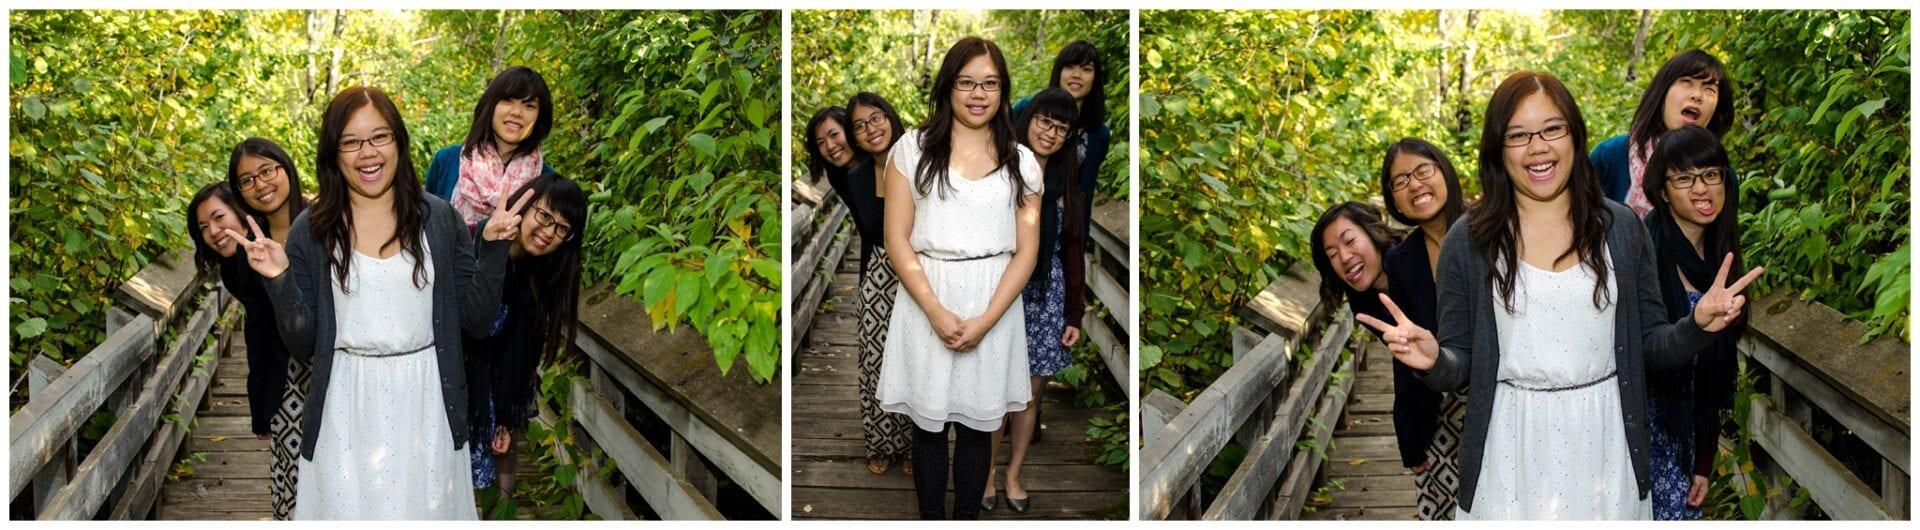 Sherwood Park Edmonton-scenery-bridge-forestnature-mpstudio-004